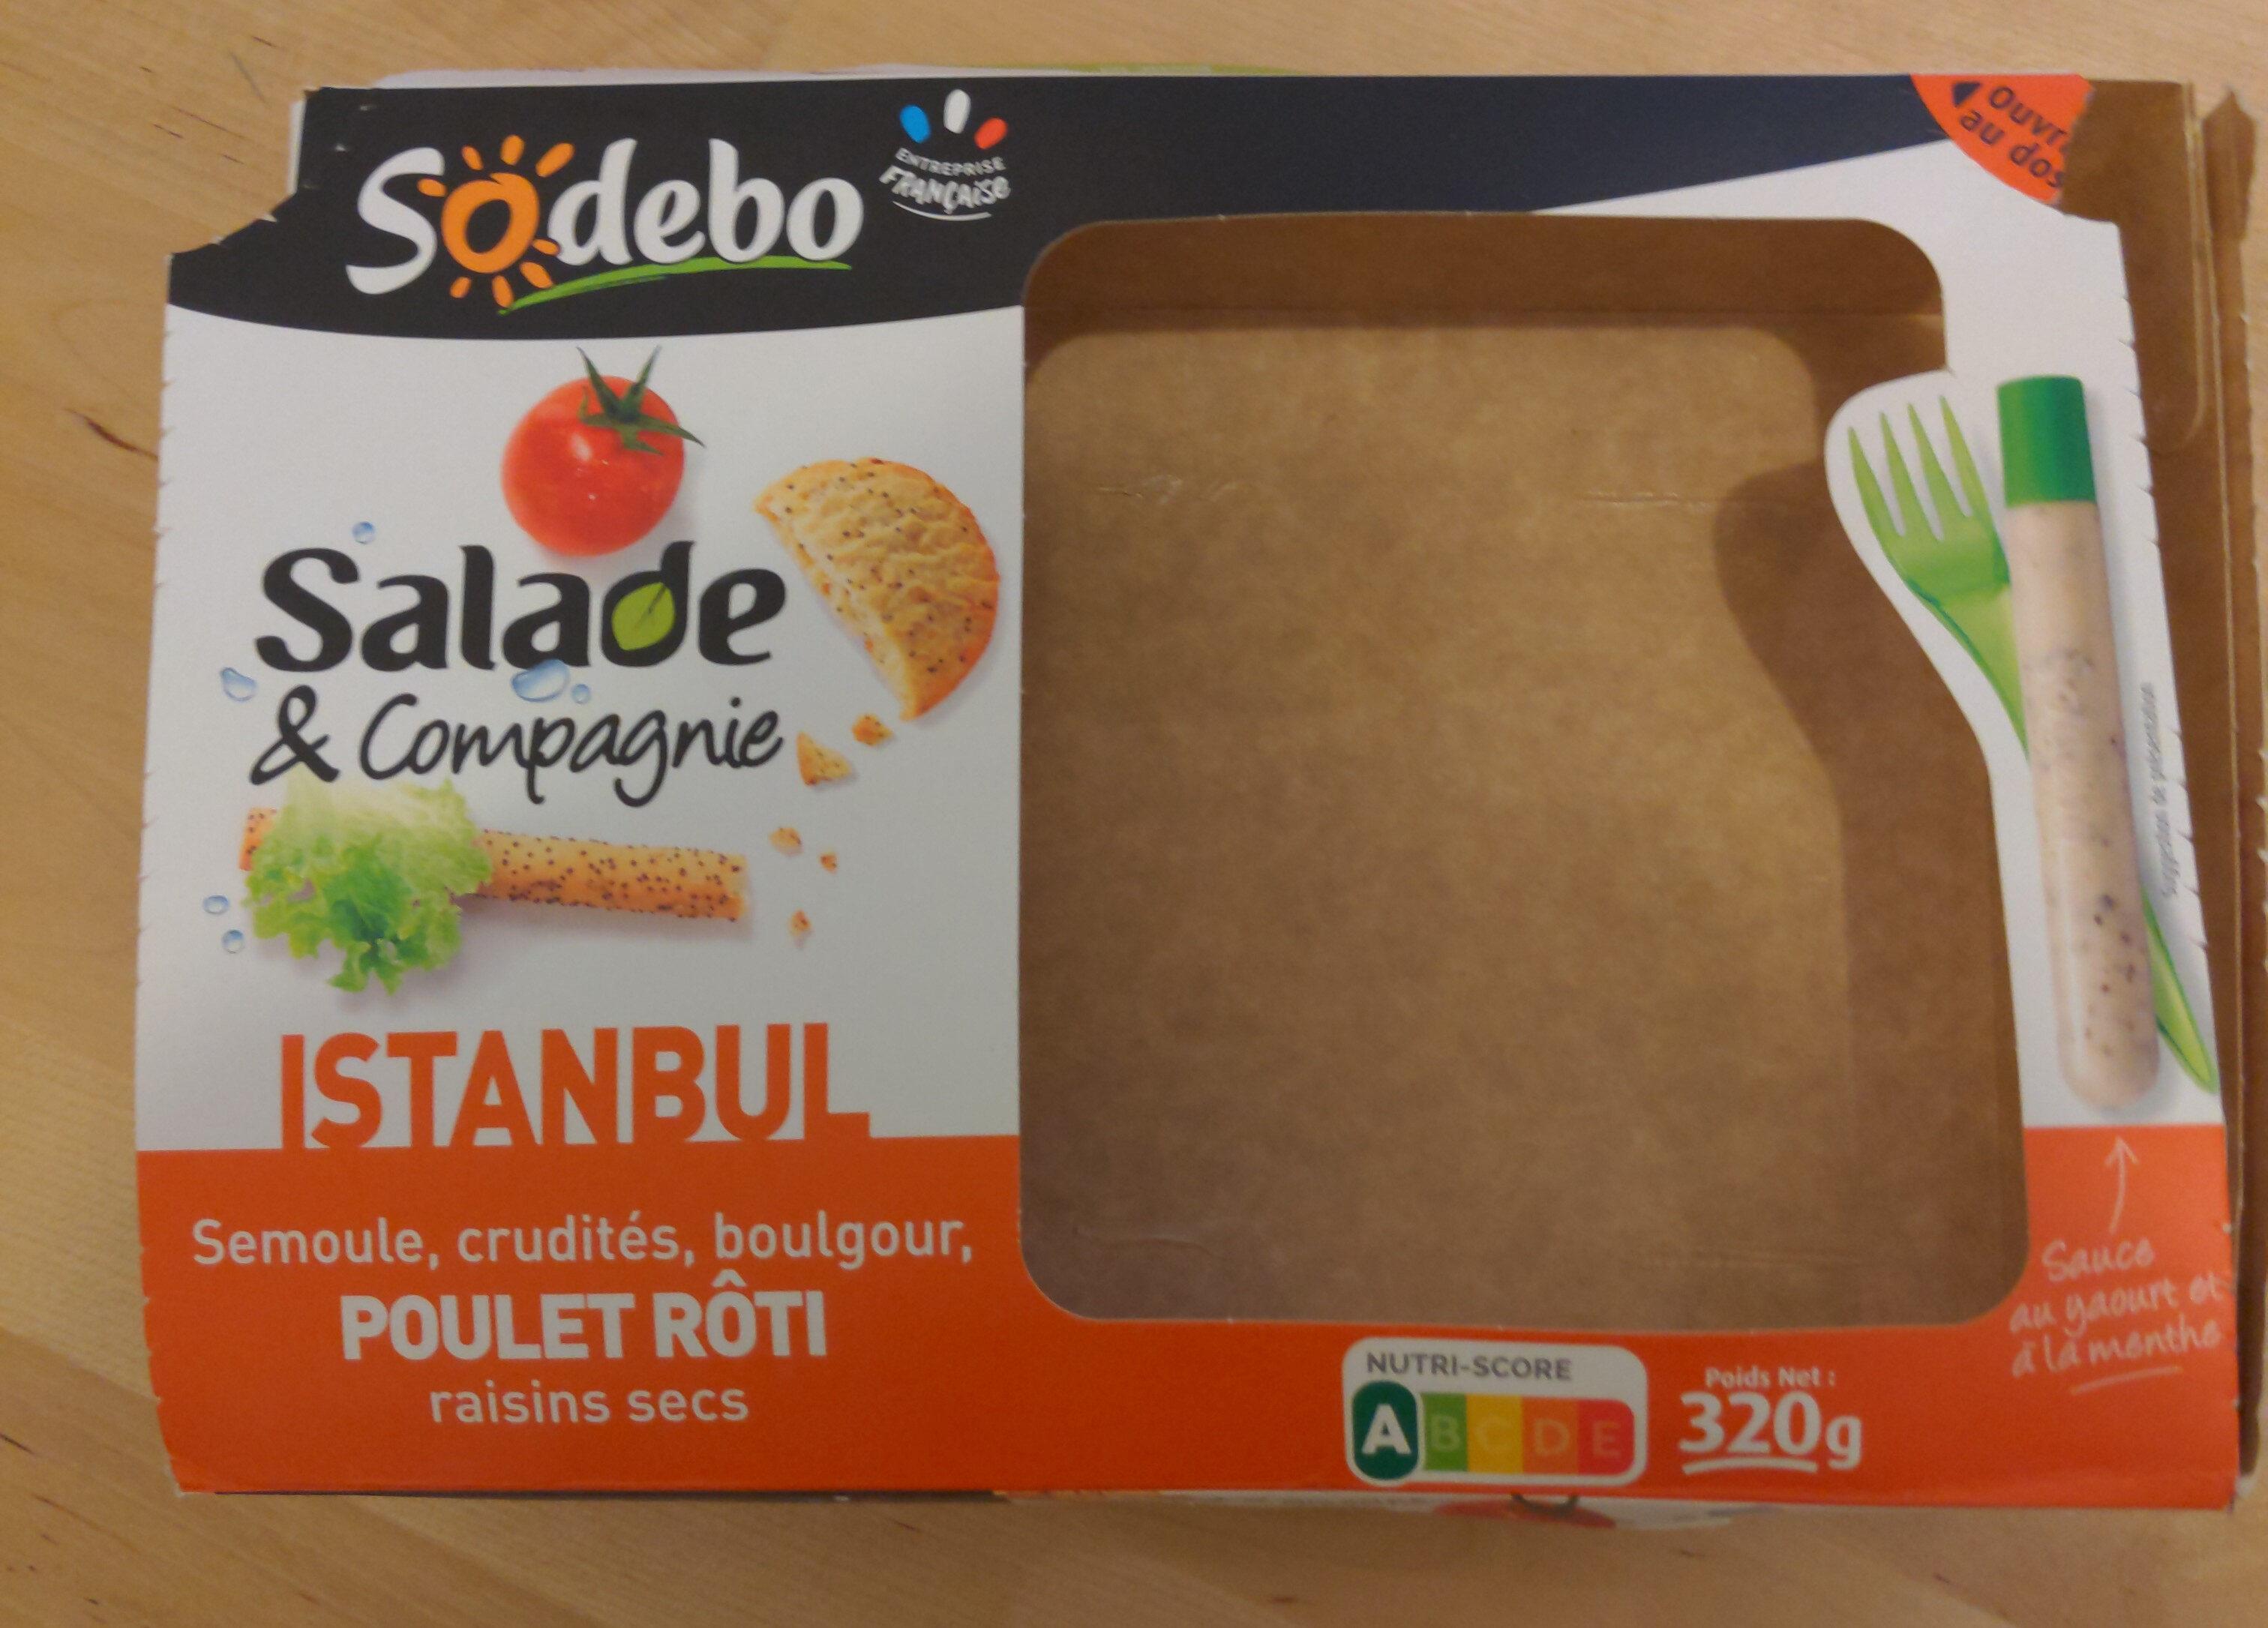 Salade & Compagnie - Istanbul - Produit - fr